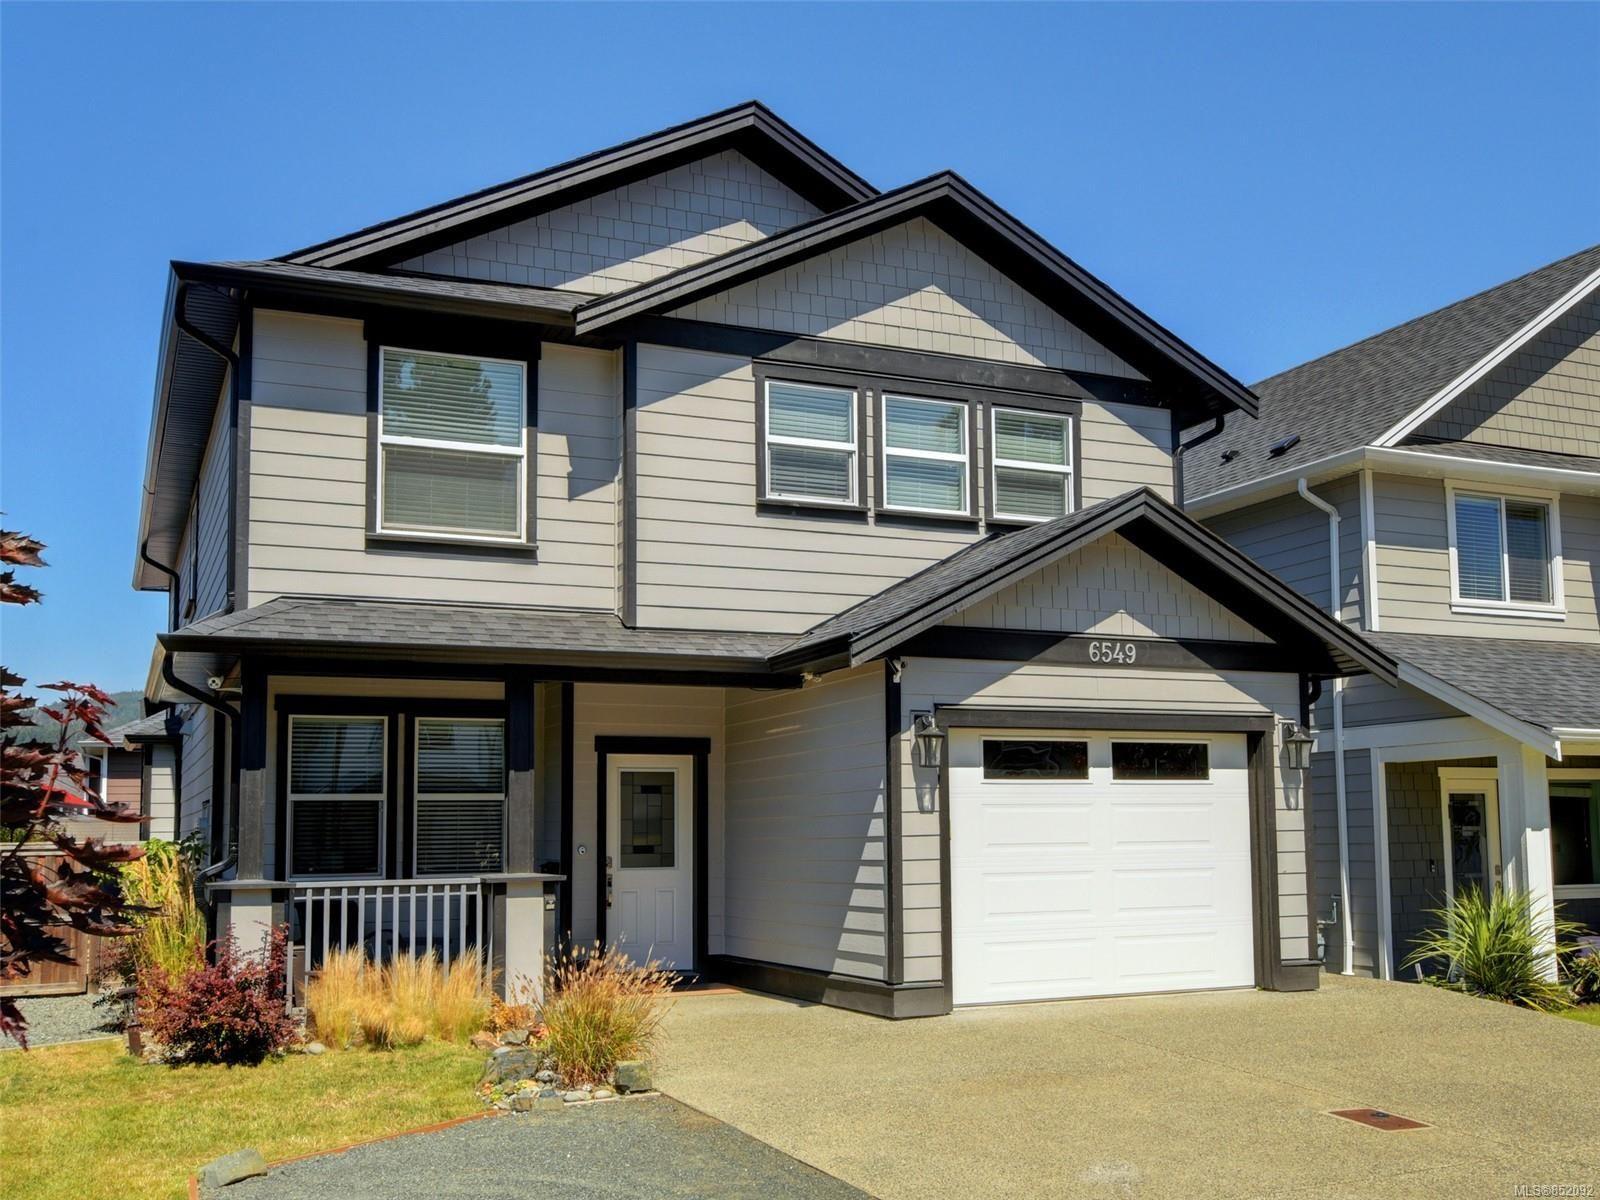 Main Photo: 6549 Steeple Chase in : Sk Sooke Vill Core House for sale (Sooke)  : MLS®# 852092